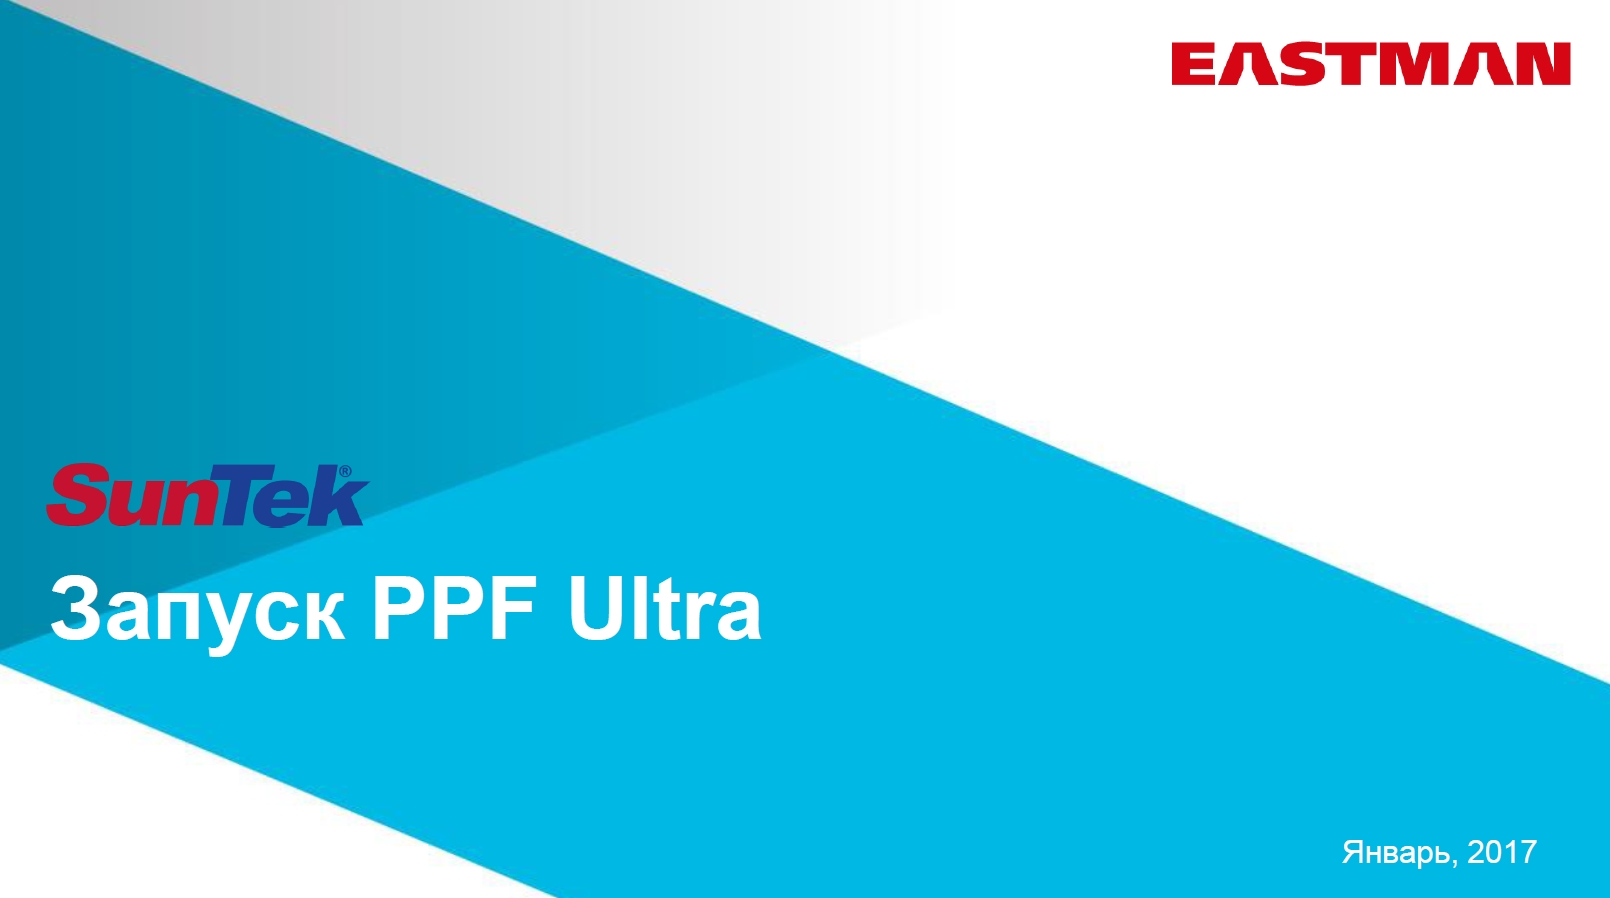 Начало производства Suntek PPF Ultra